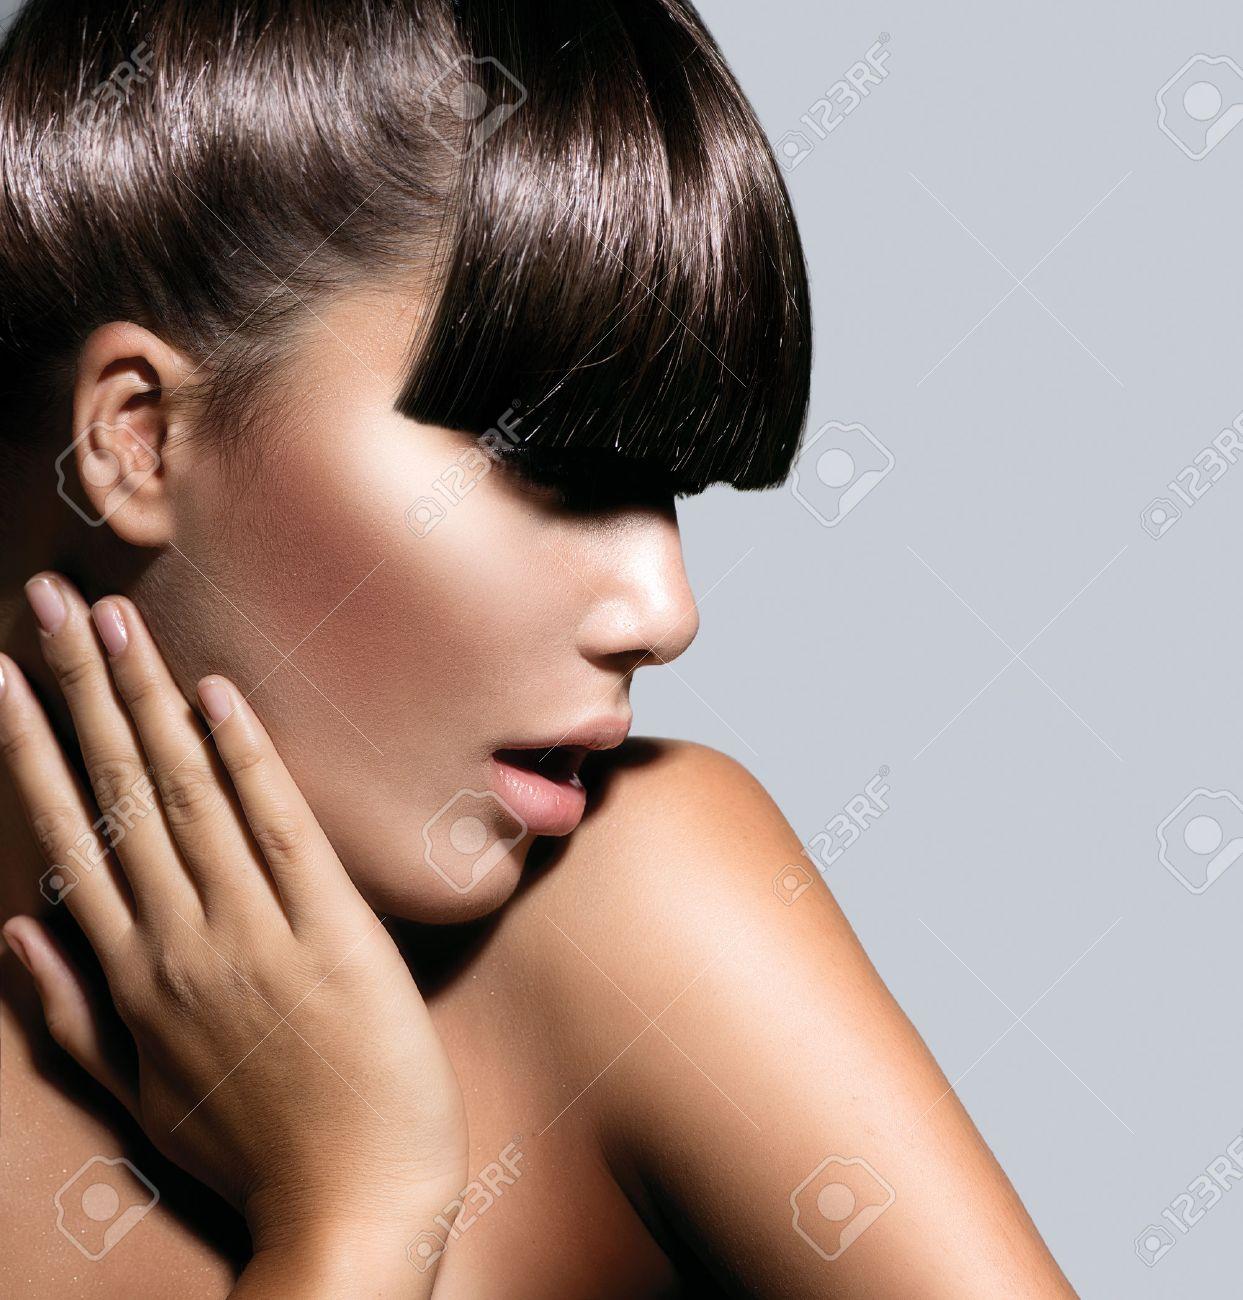 Fashion Model Girl With Trendy Hairstyle Haircut Stock Photo - Haircut girl model